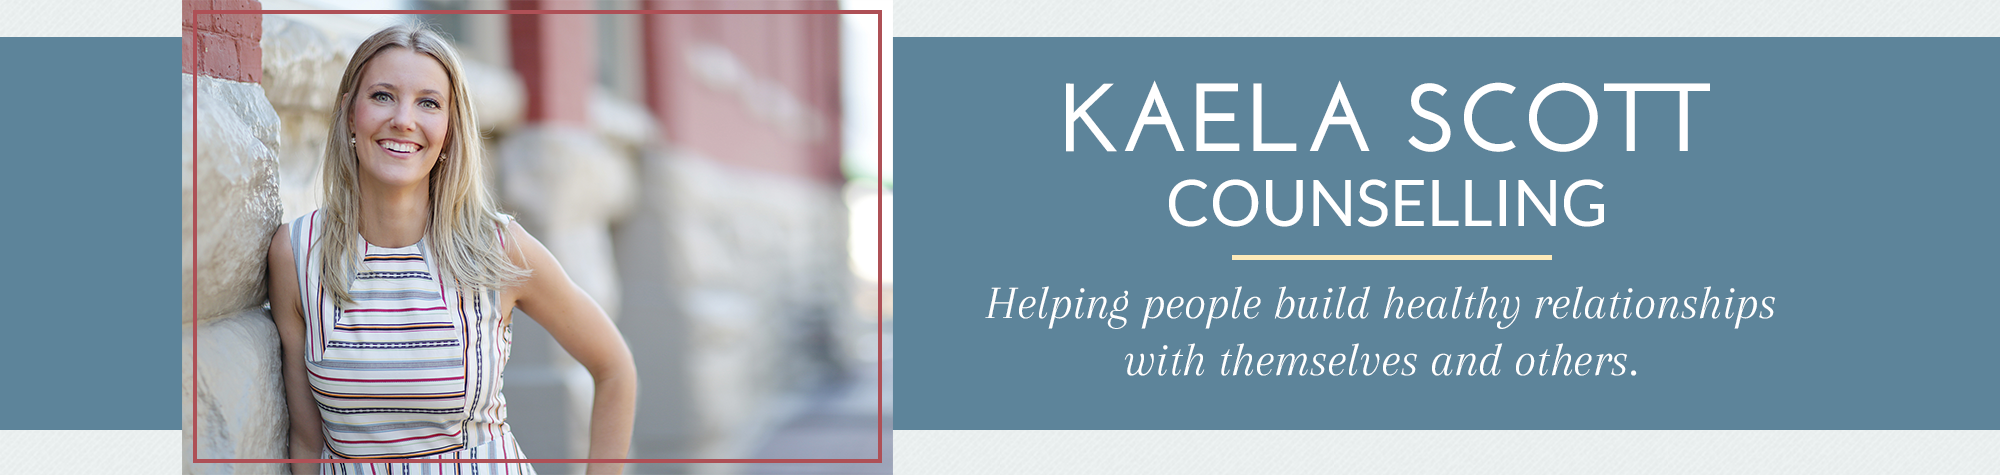 Kaela Scott Counselling header image